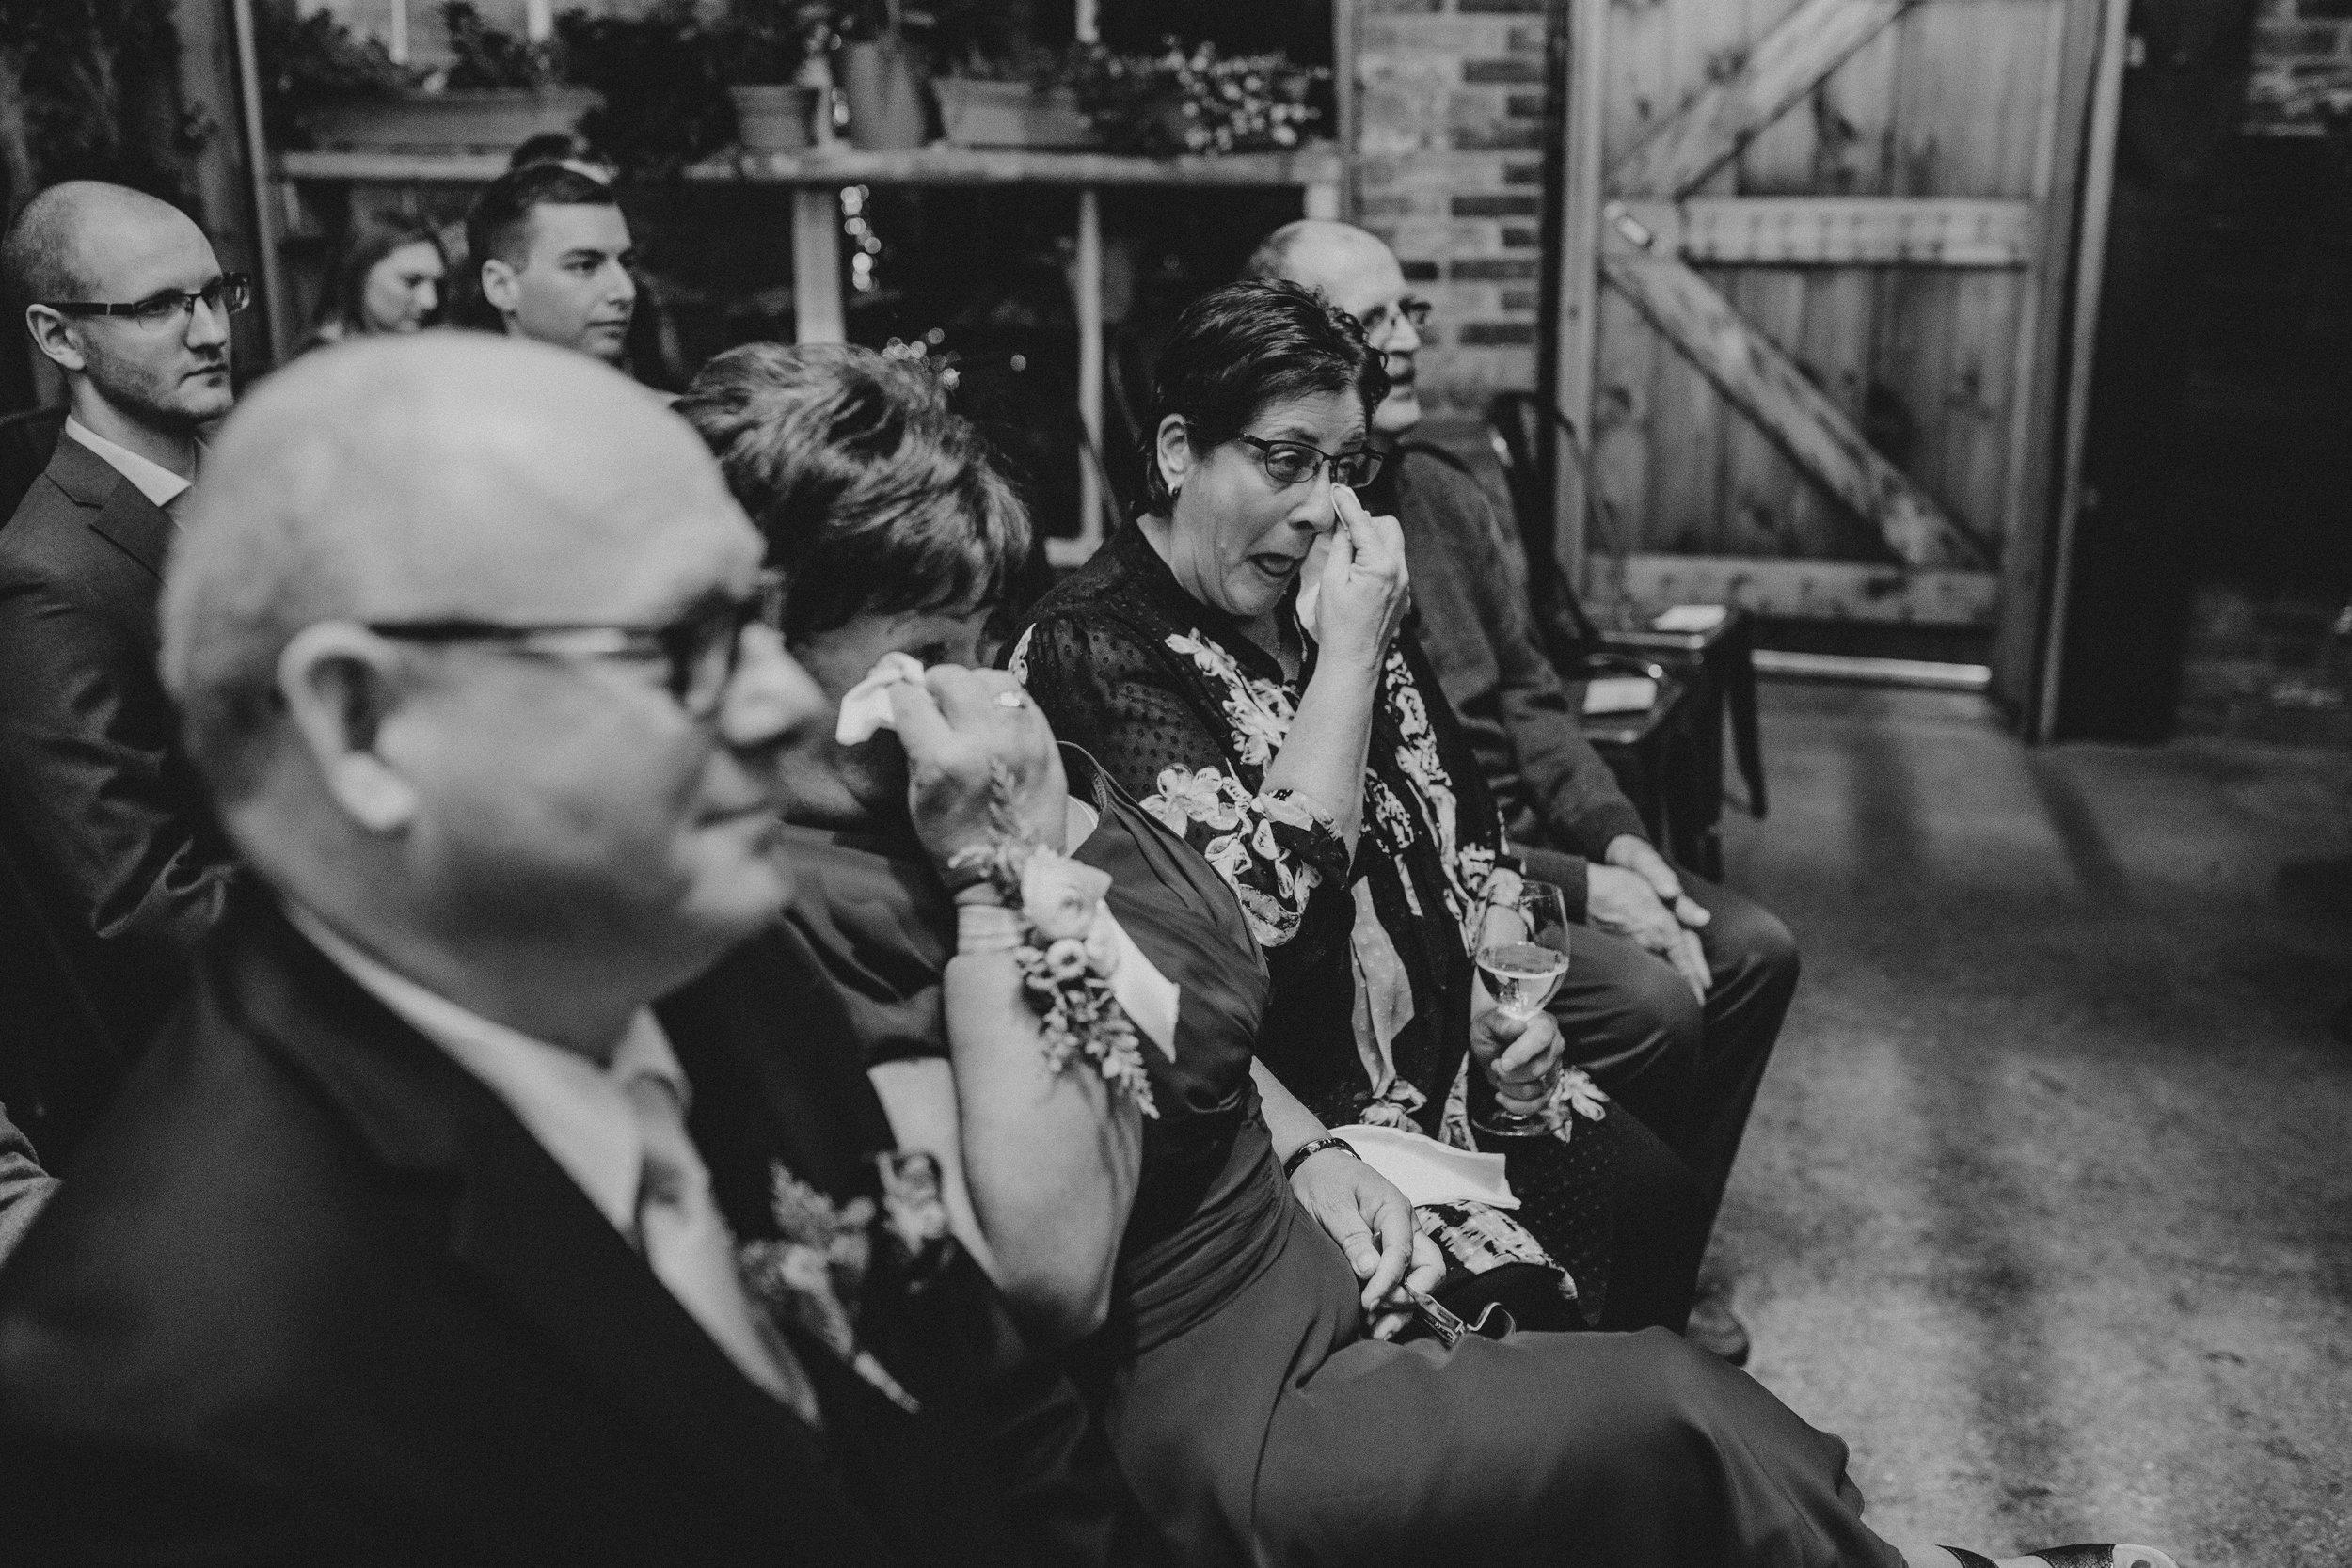 lucas_confectionery_wedding_058.JPG